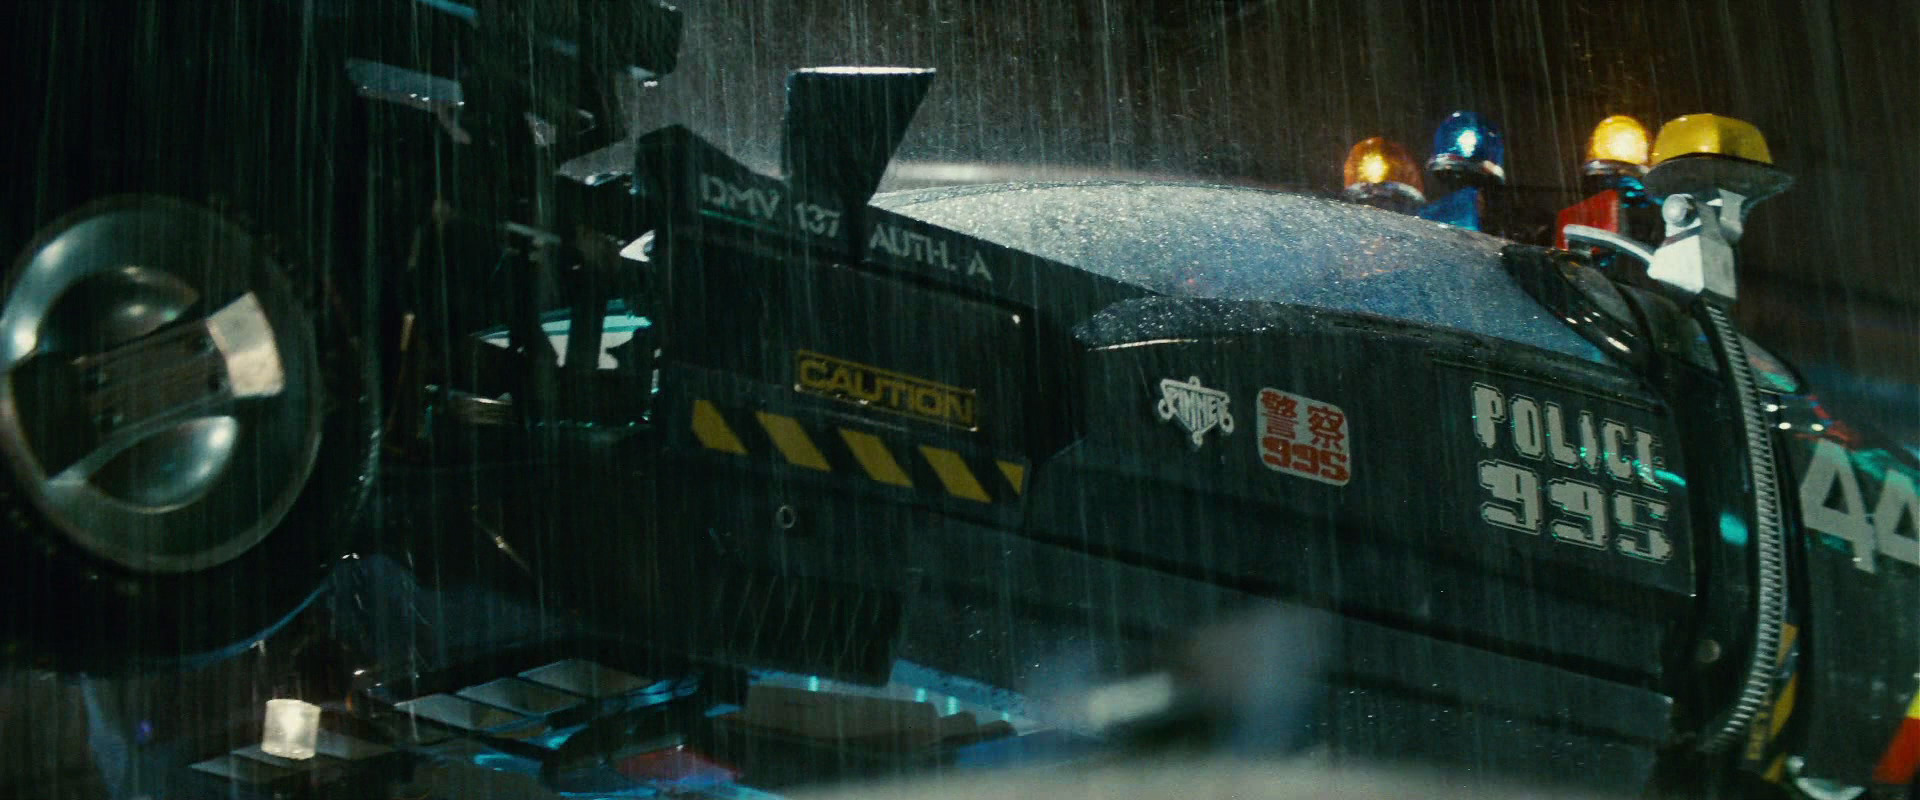 Police Sinner Upclose (Bladerunner).png